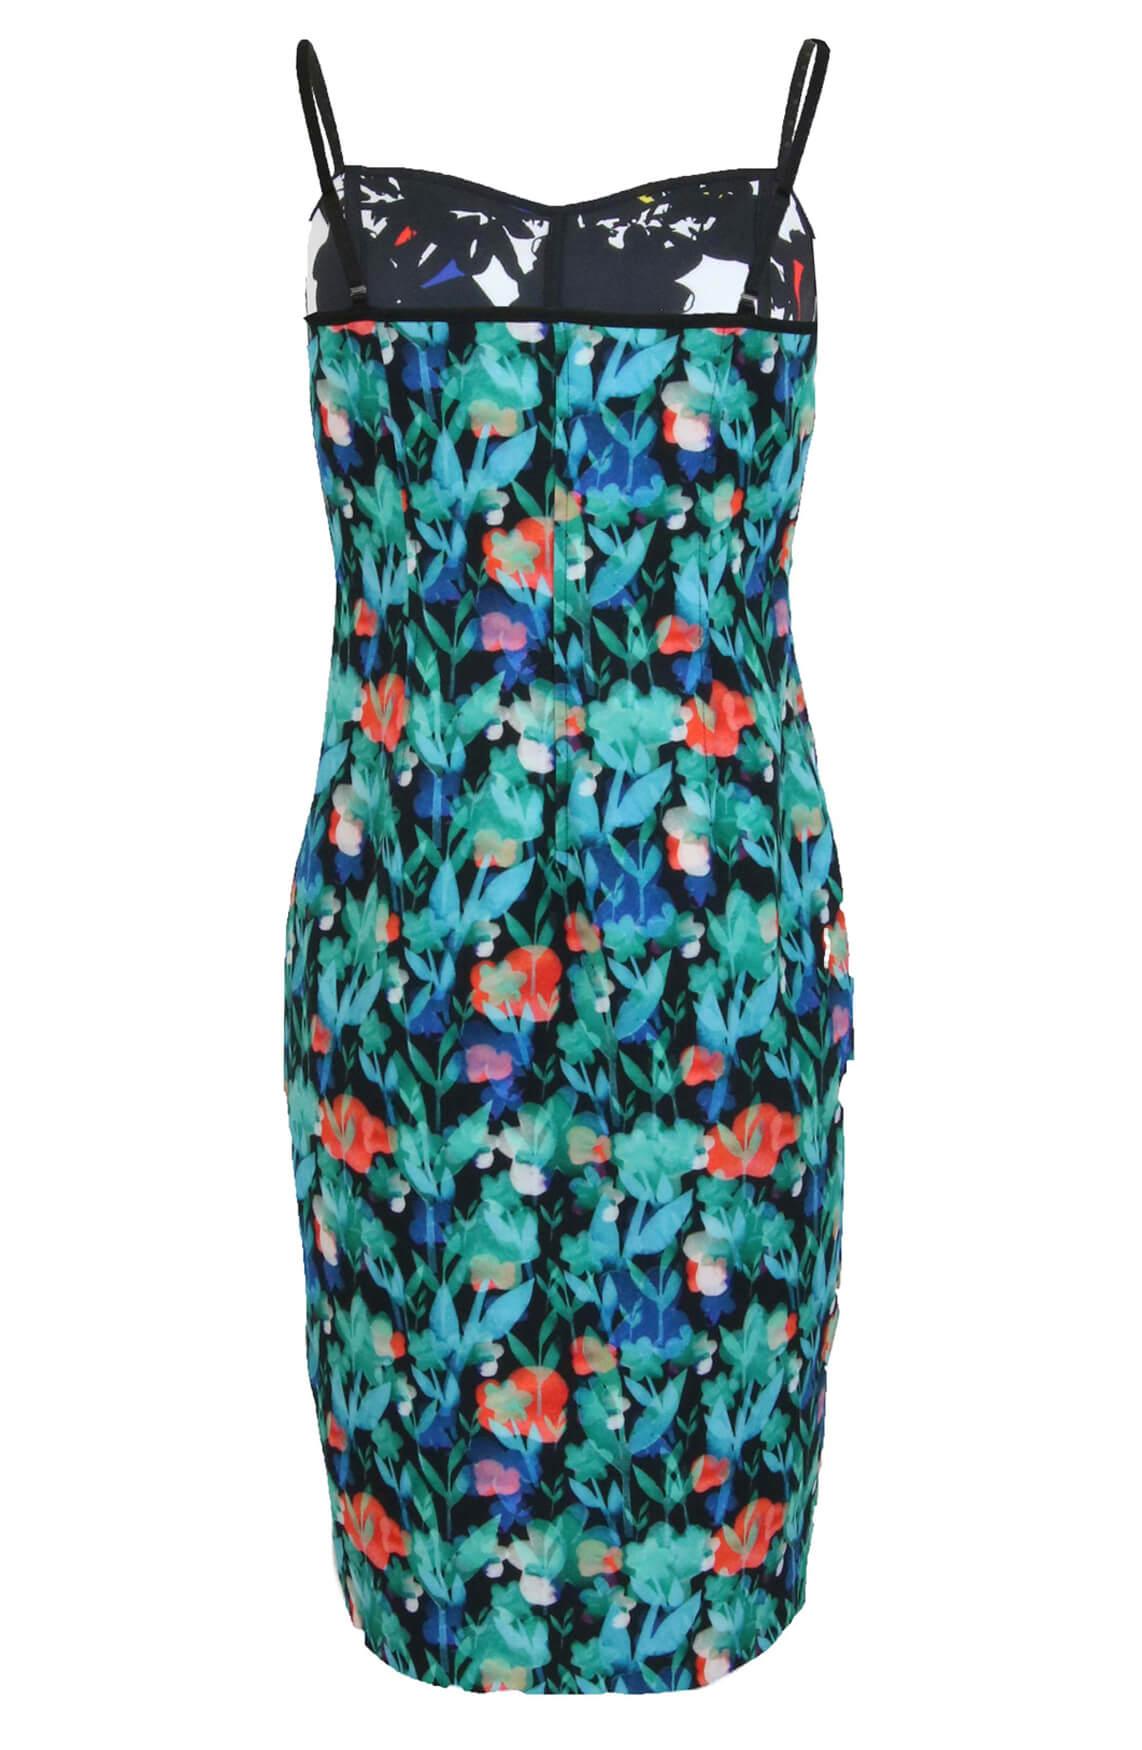 Eroke Dames Reversible jurk MultiColor